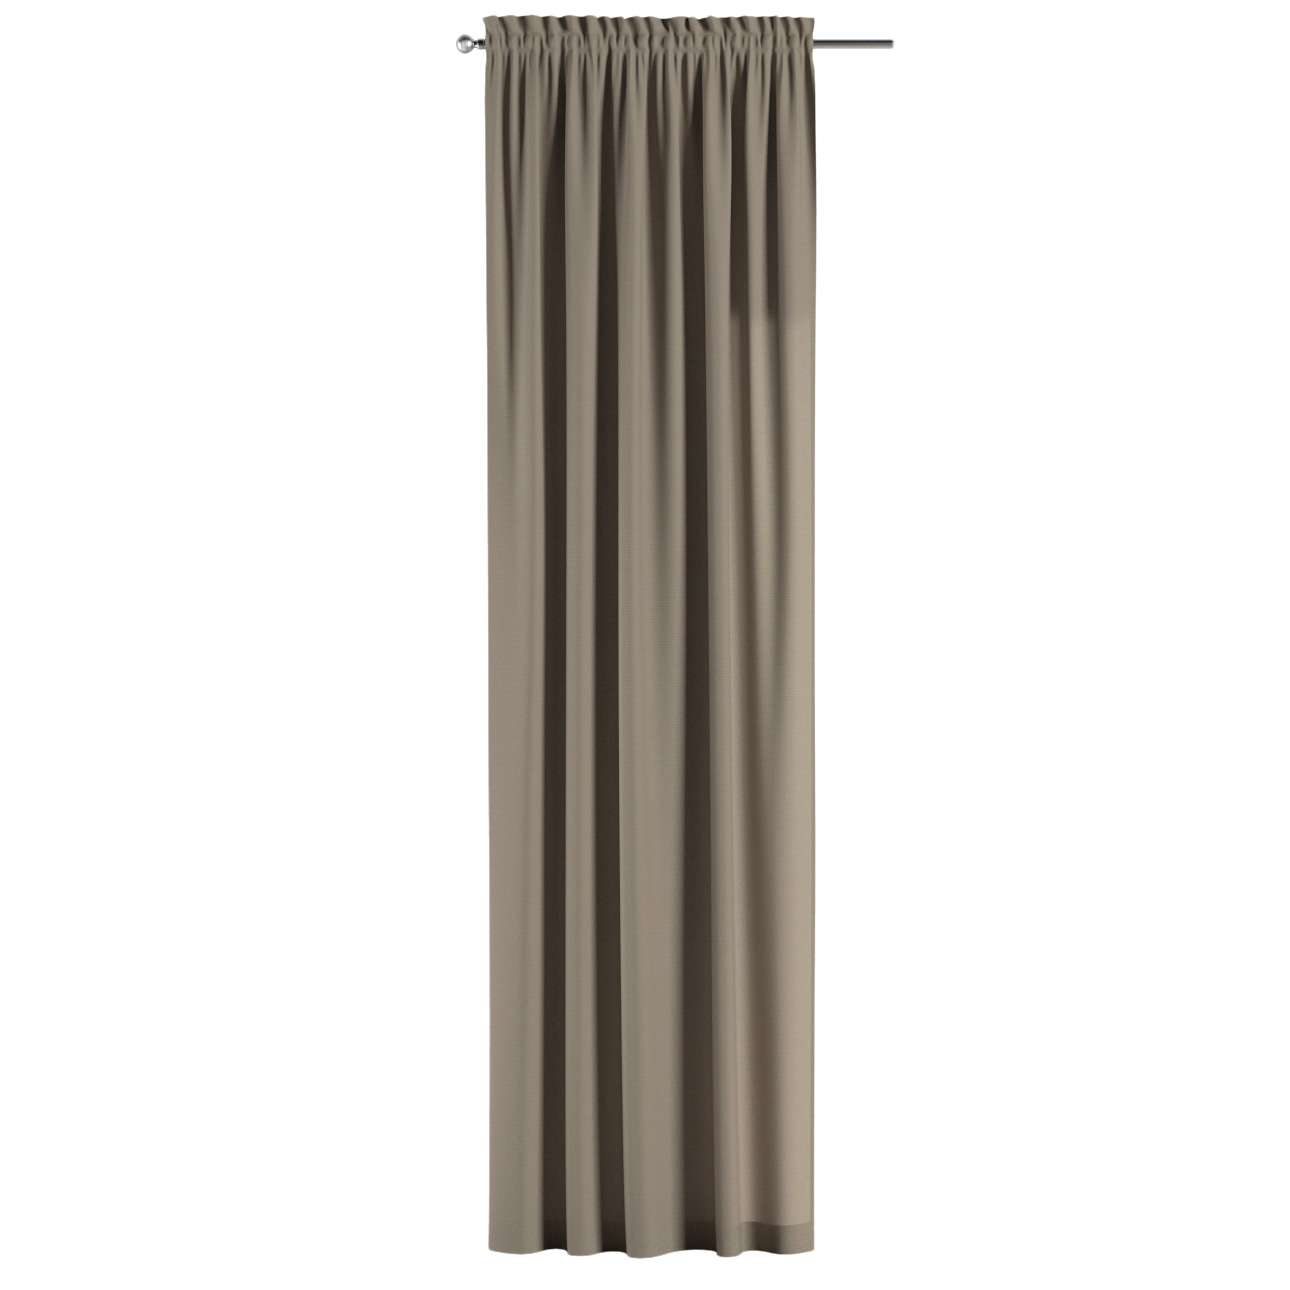 Gardin med kanal - Multiband 1 längd i kollektionen Panama Cotton, Tyg: 702-28